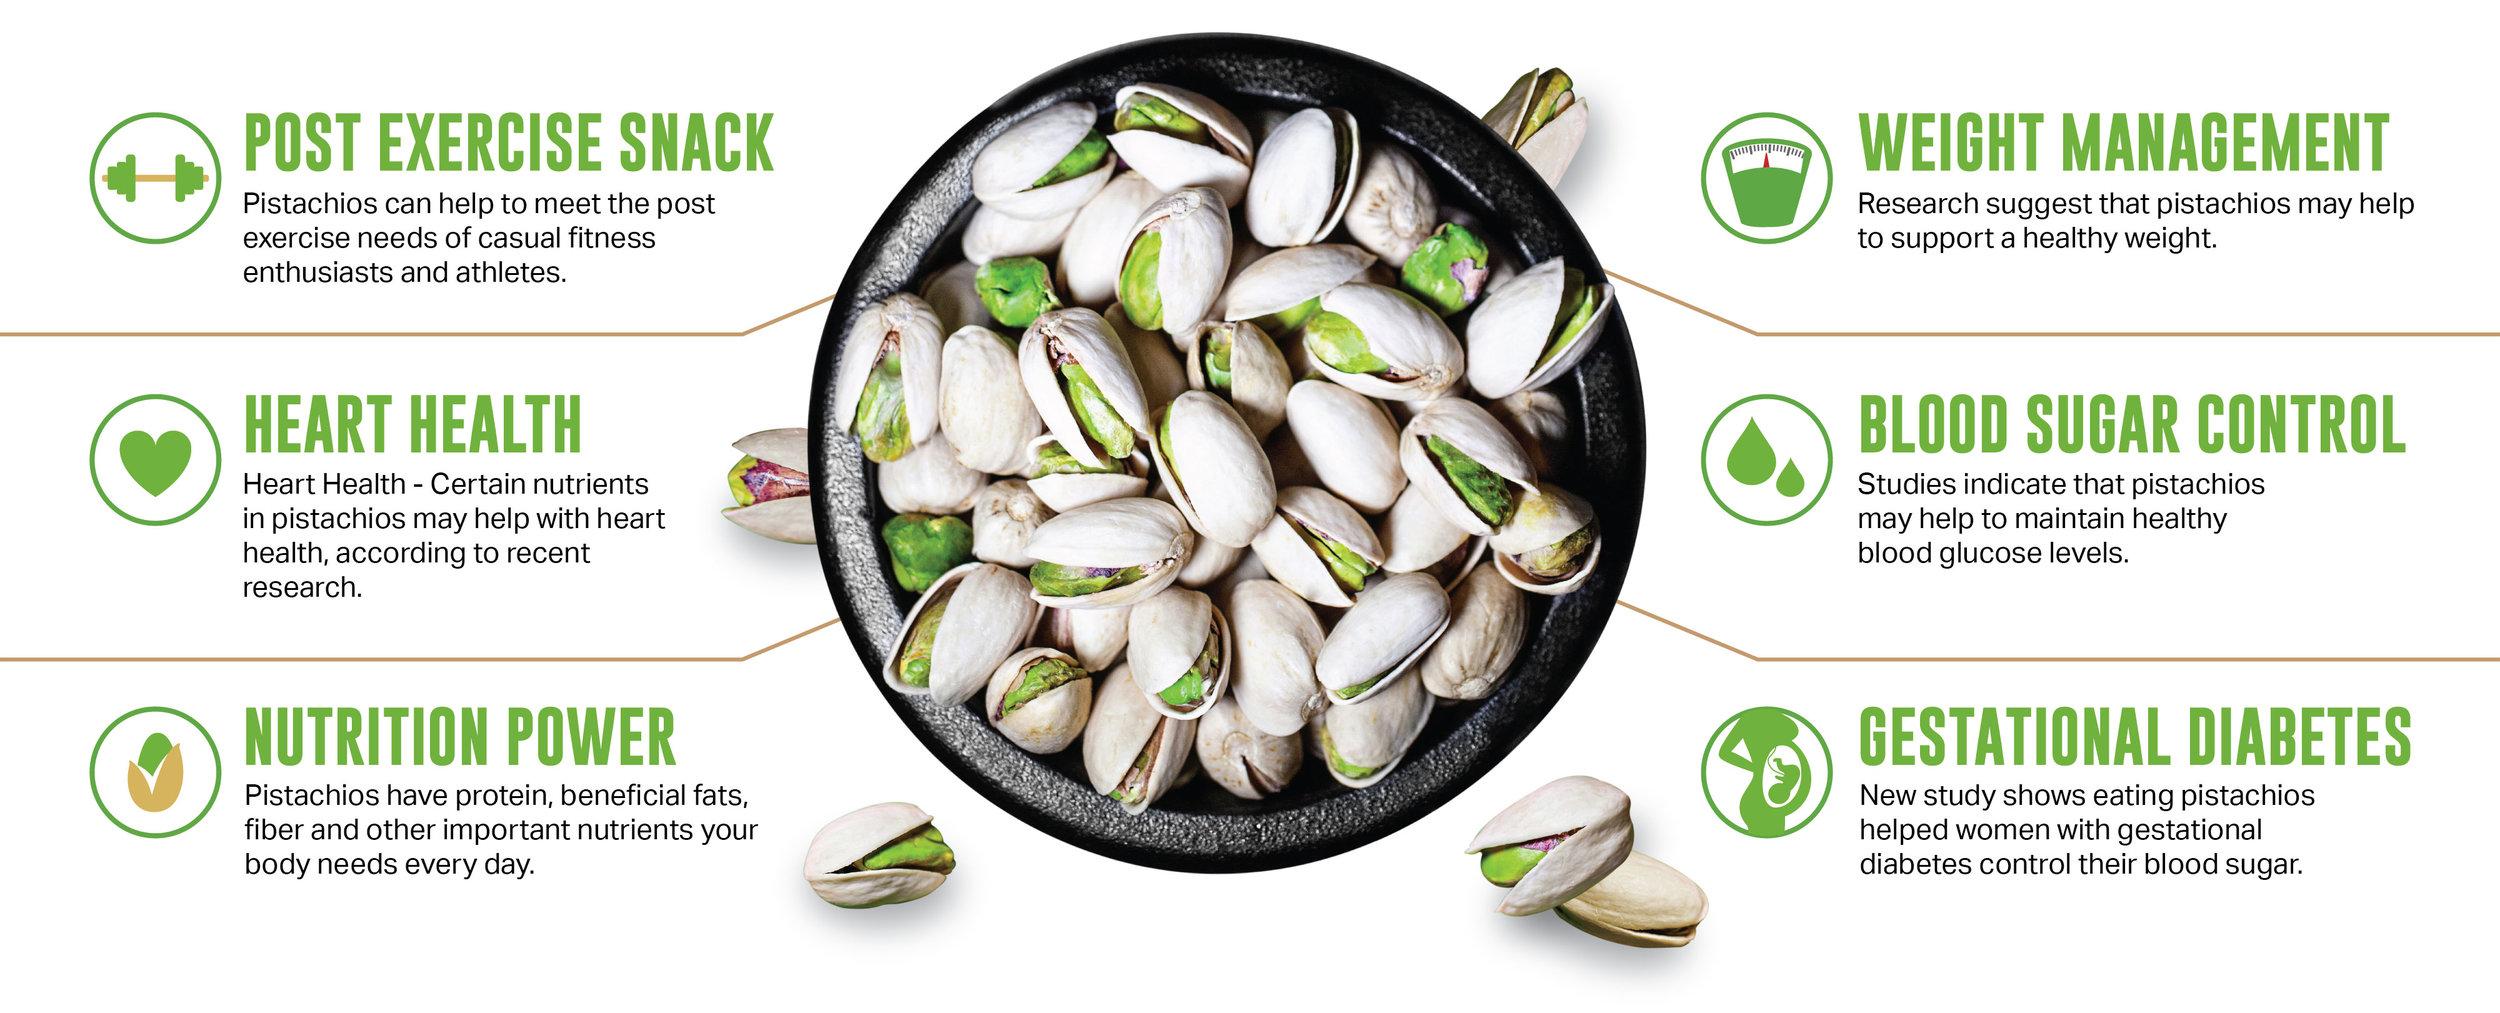 premiumnut com pistachio nutritional information